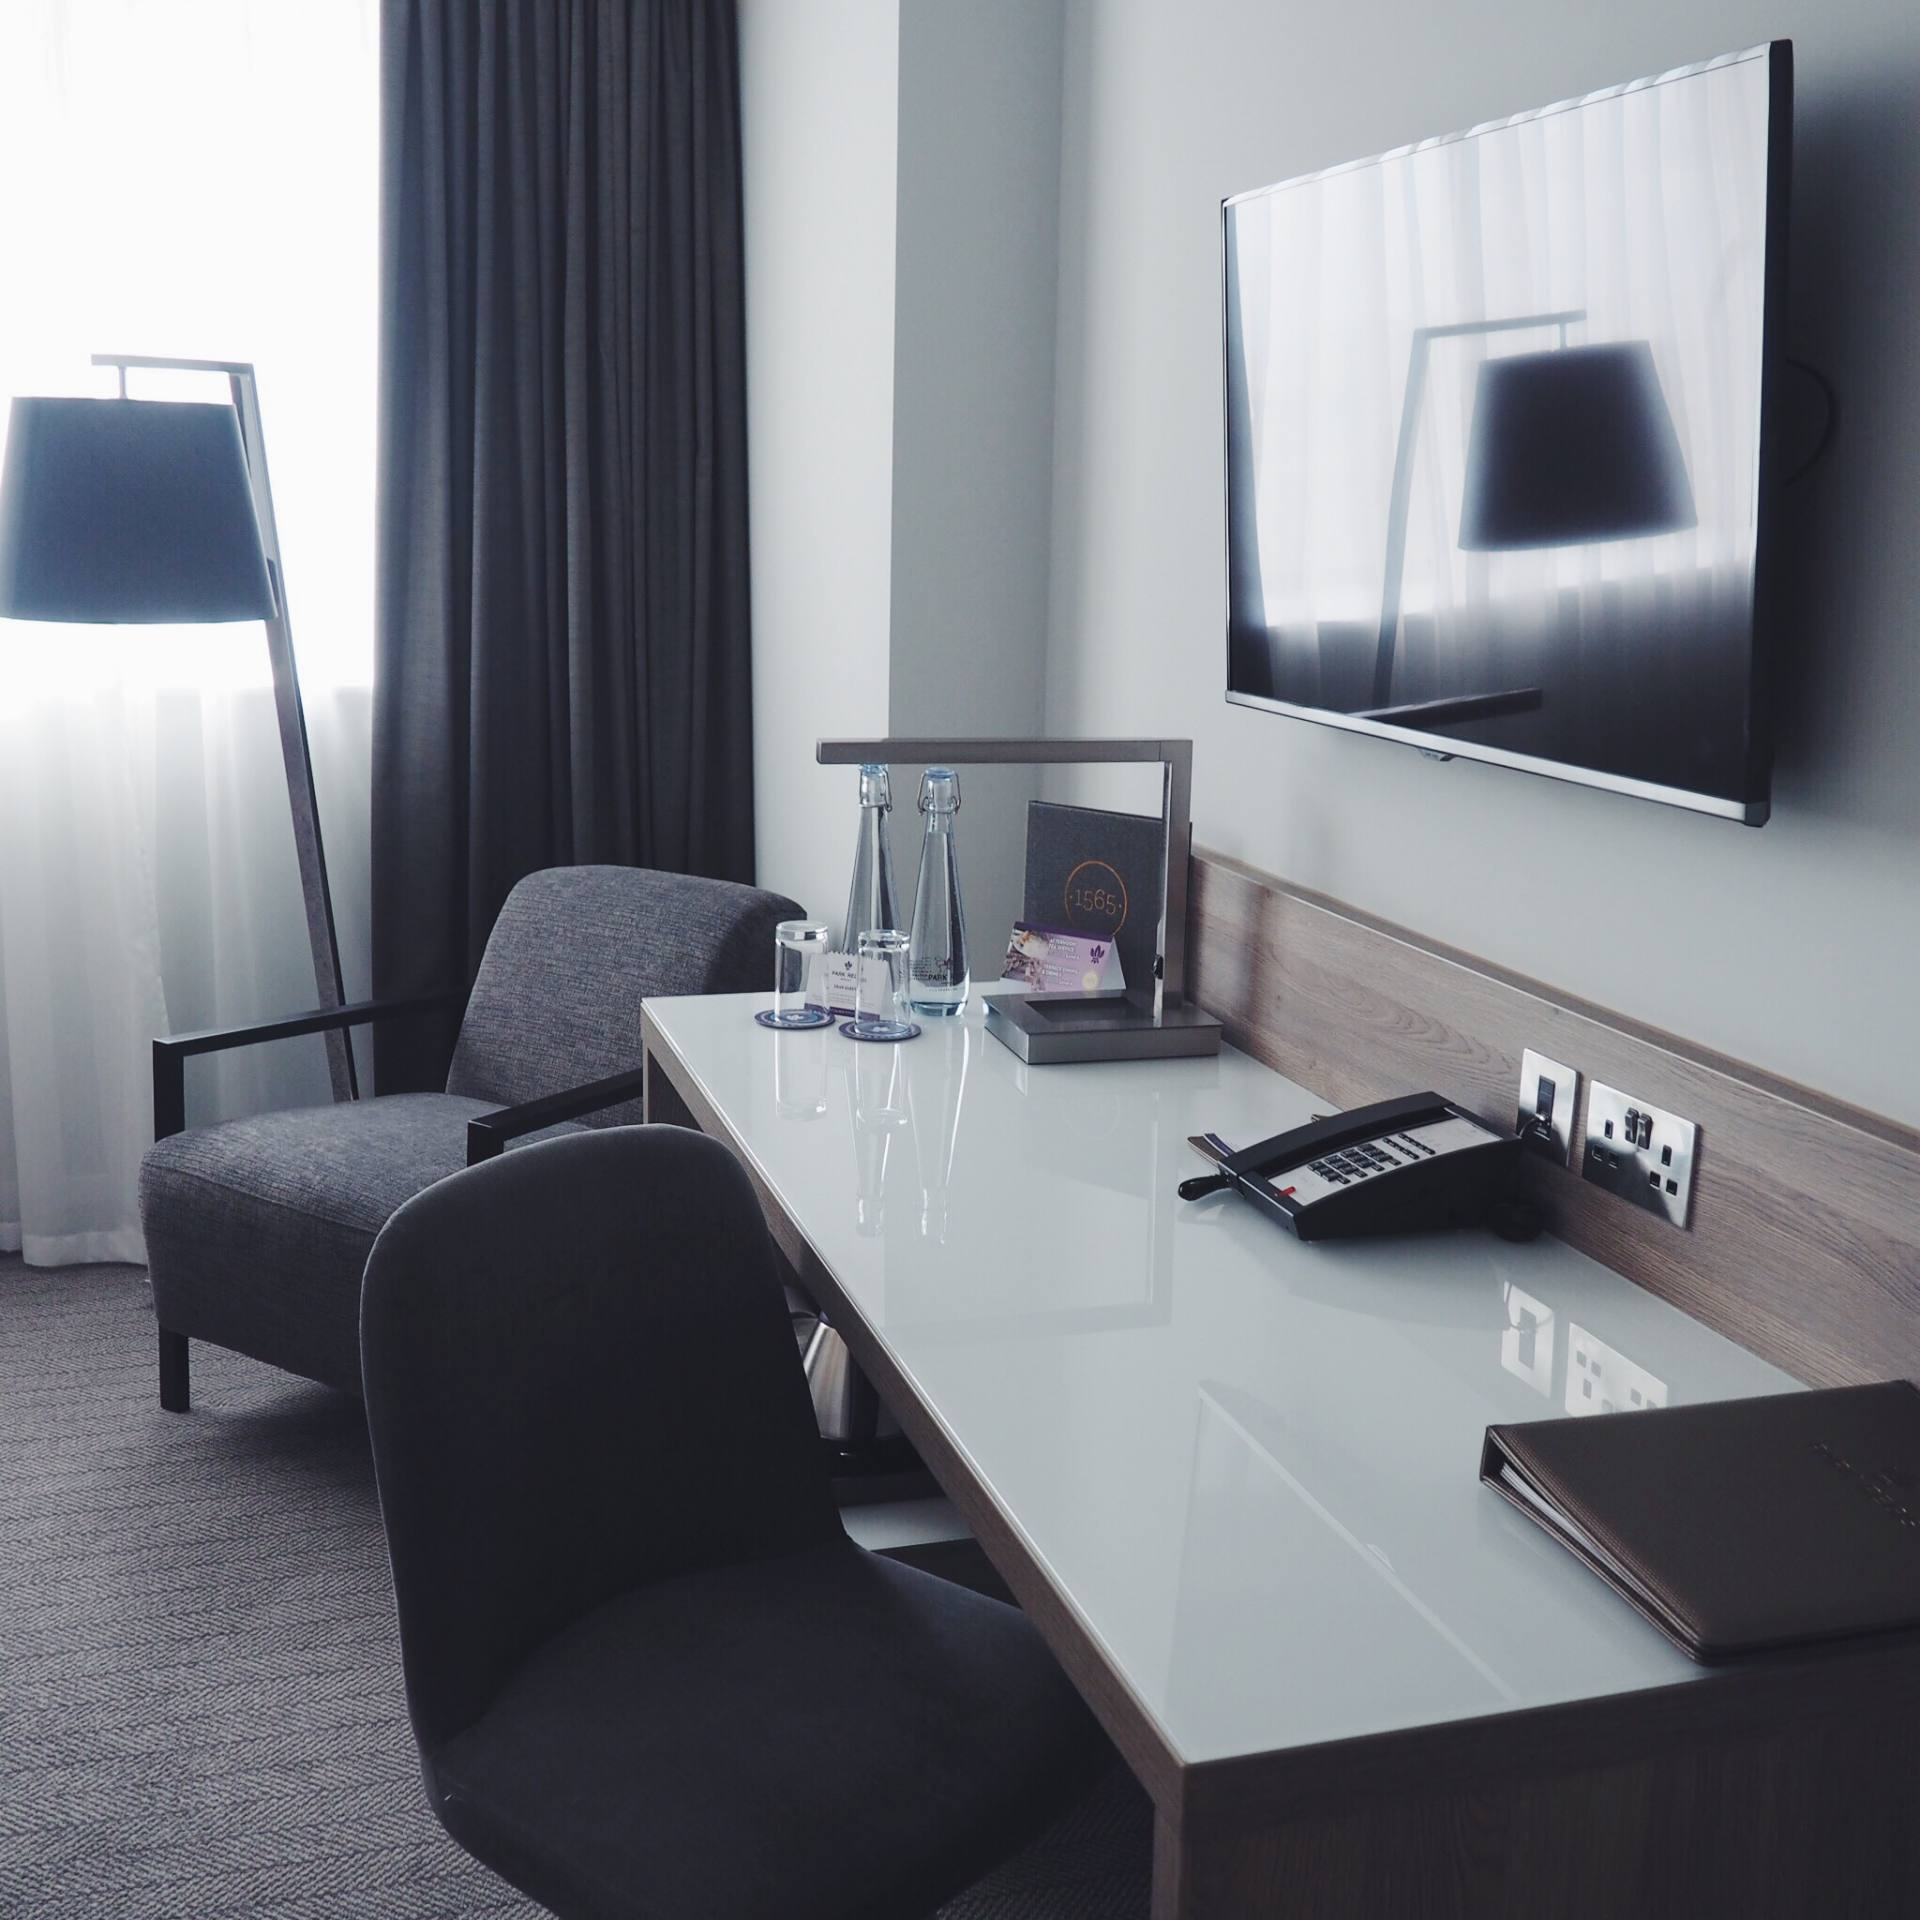 Park Regis Executive Room